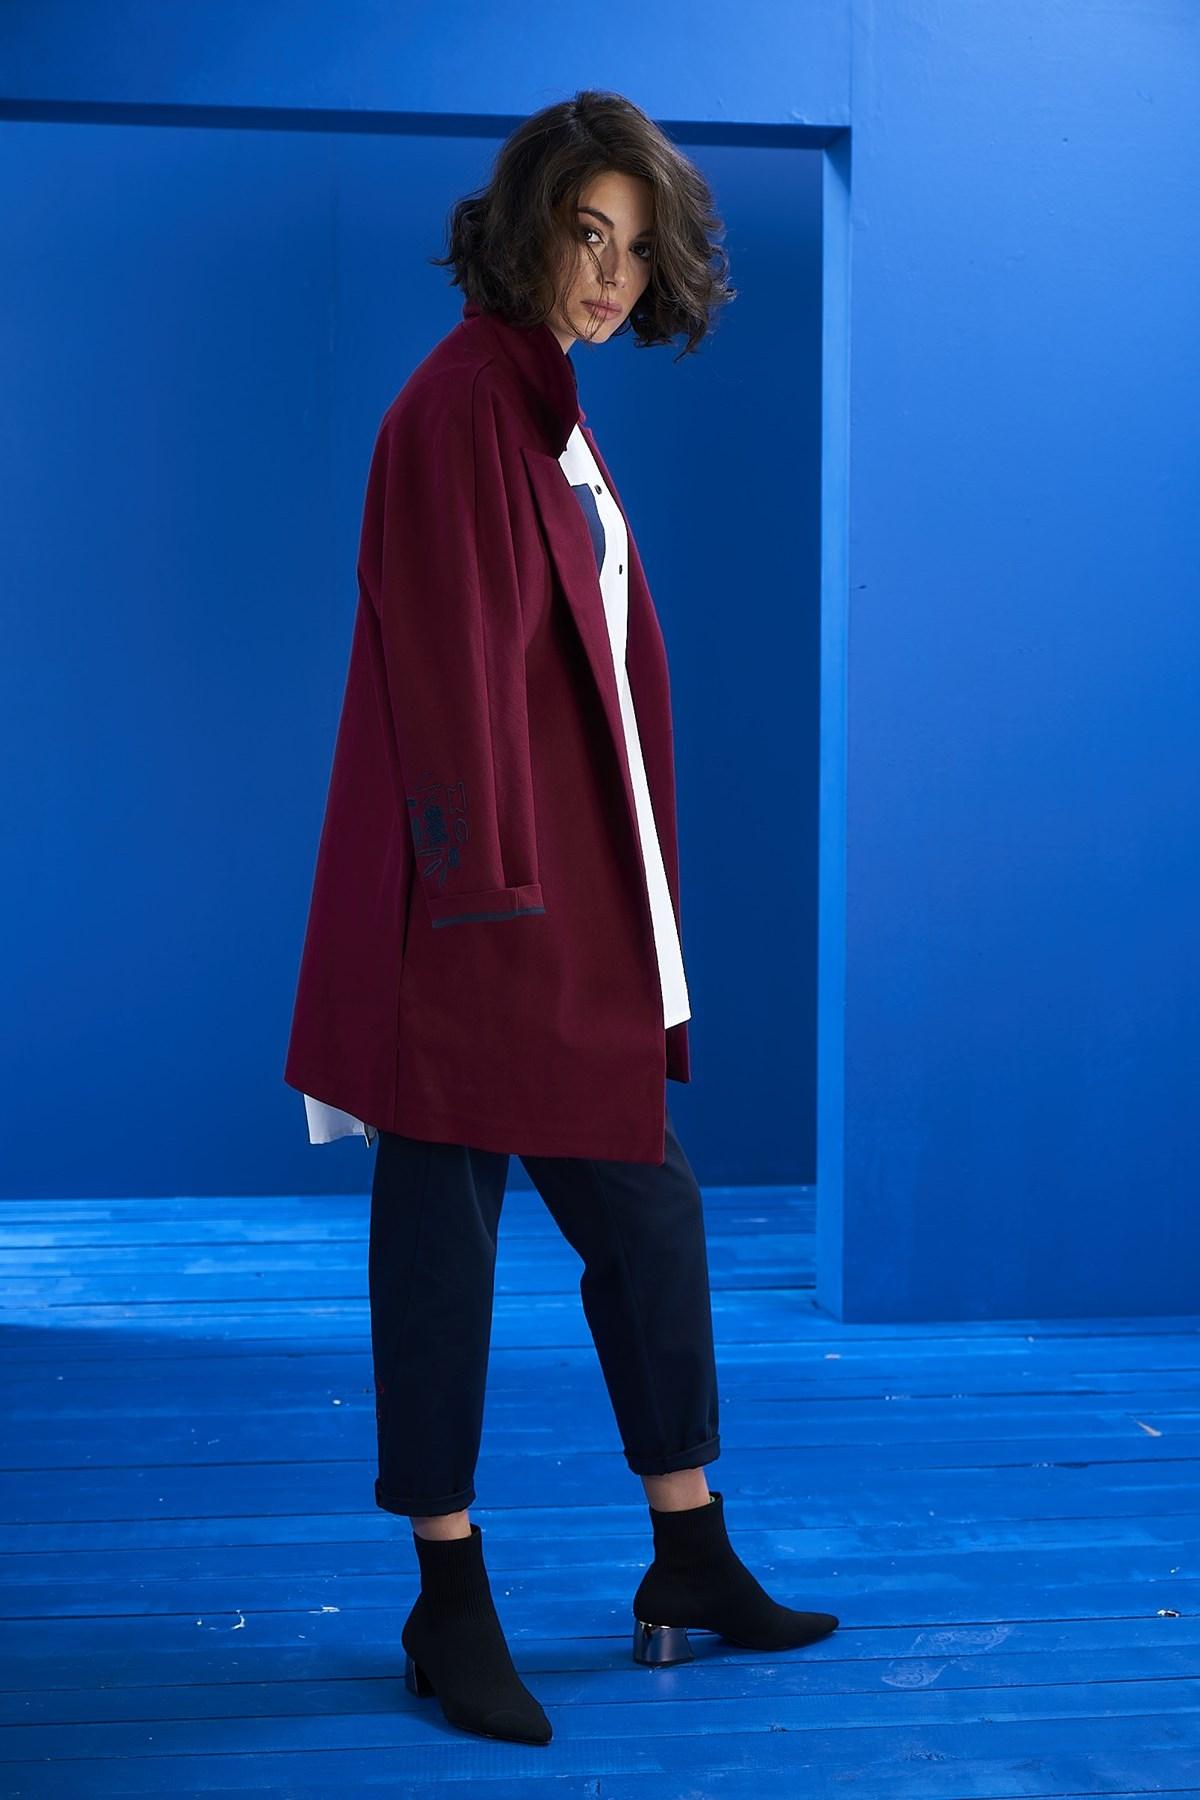 Mevra - Bordo Nakış Detay Blazer Ceket